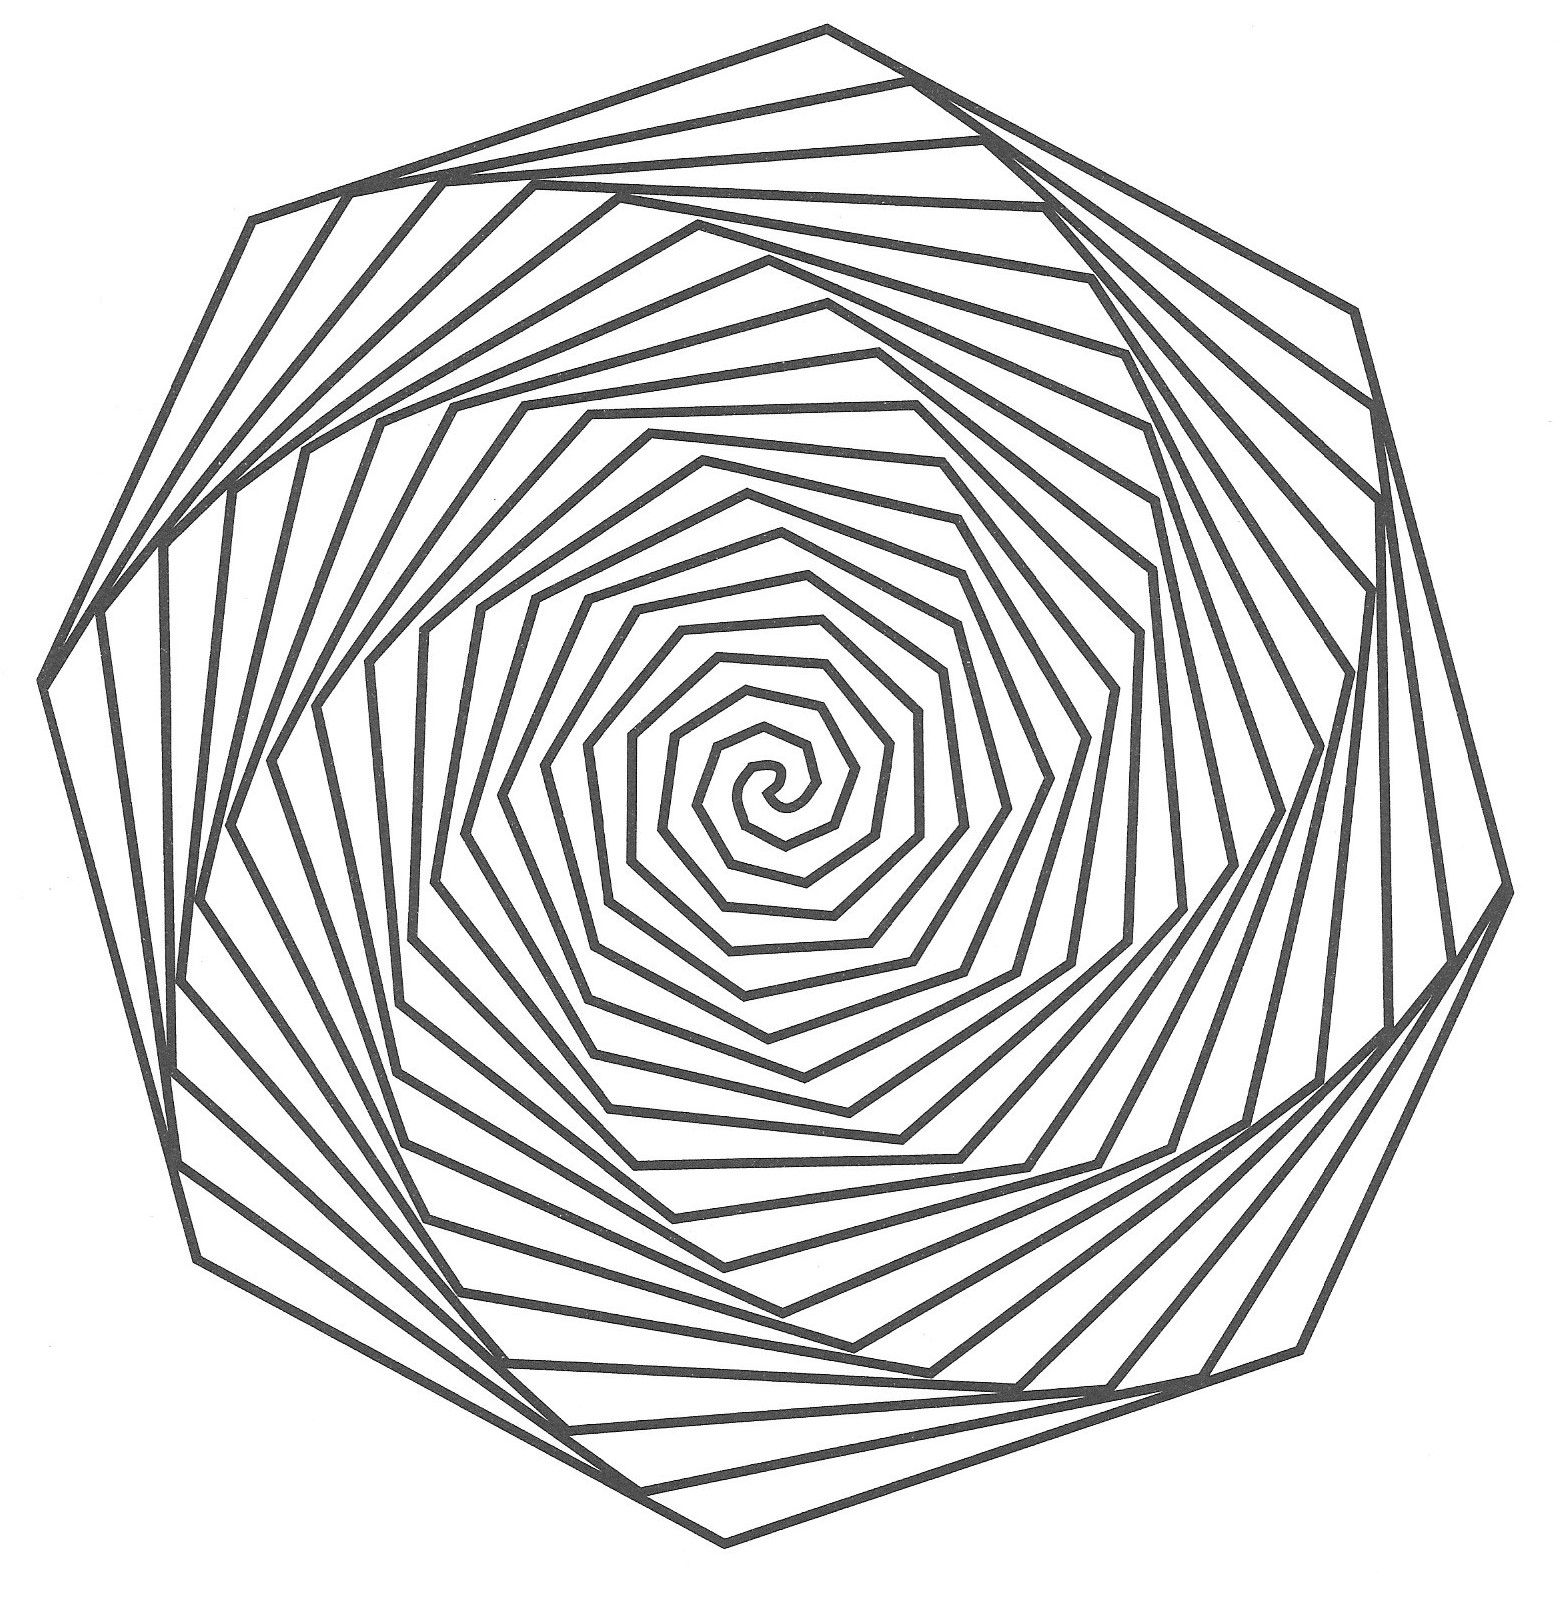 Mandala Optik optische täuschung | Malvorlagen - Coloring Pages ...